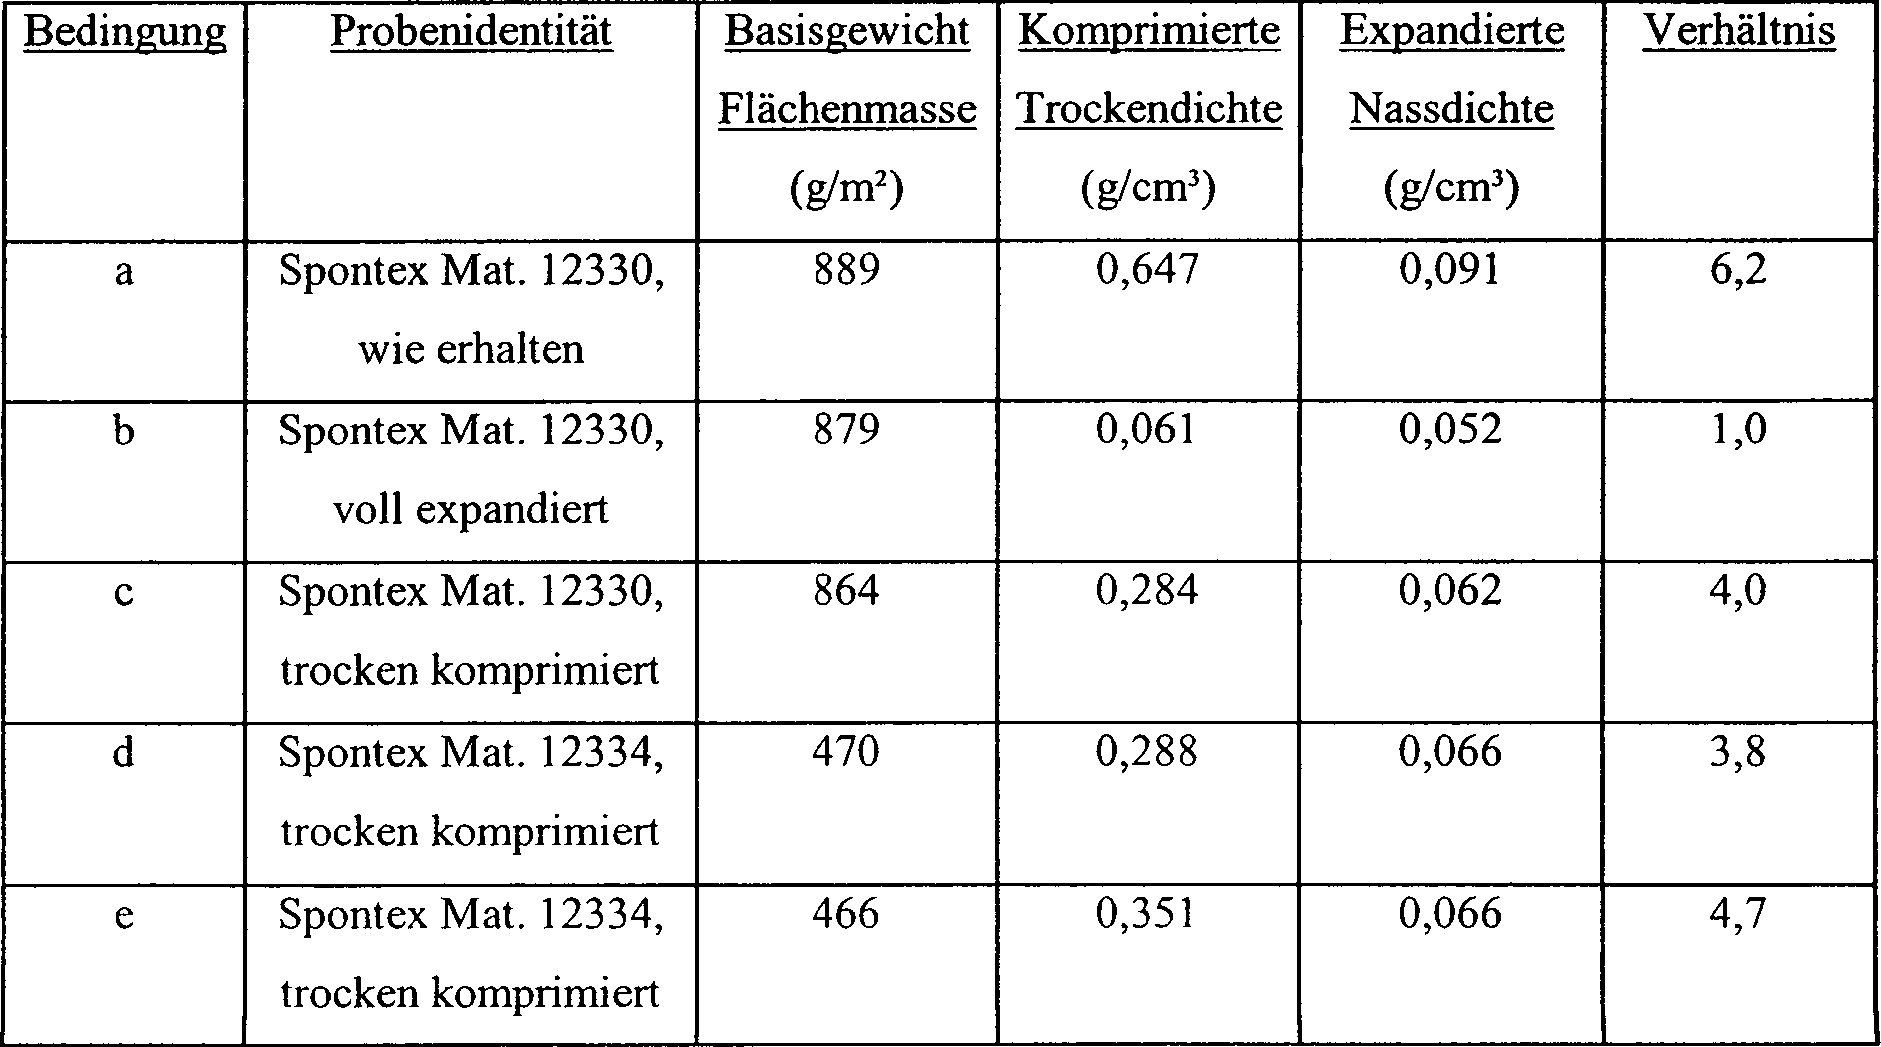 Table Haute Extensible Génial De T2 Thin to Wet Structures for Recording Body Of 30 Frais Table Haute Extensible